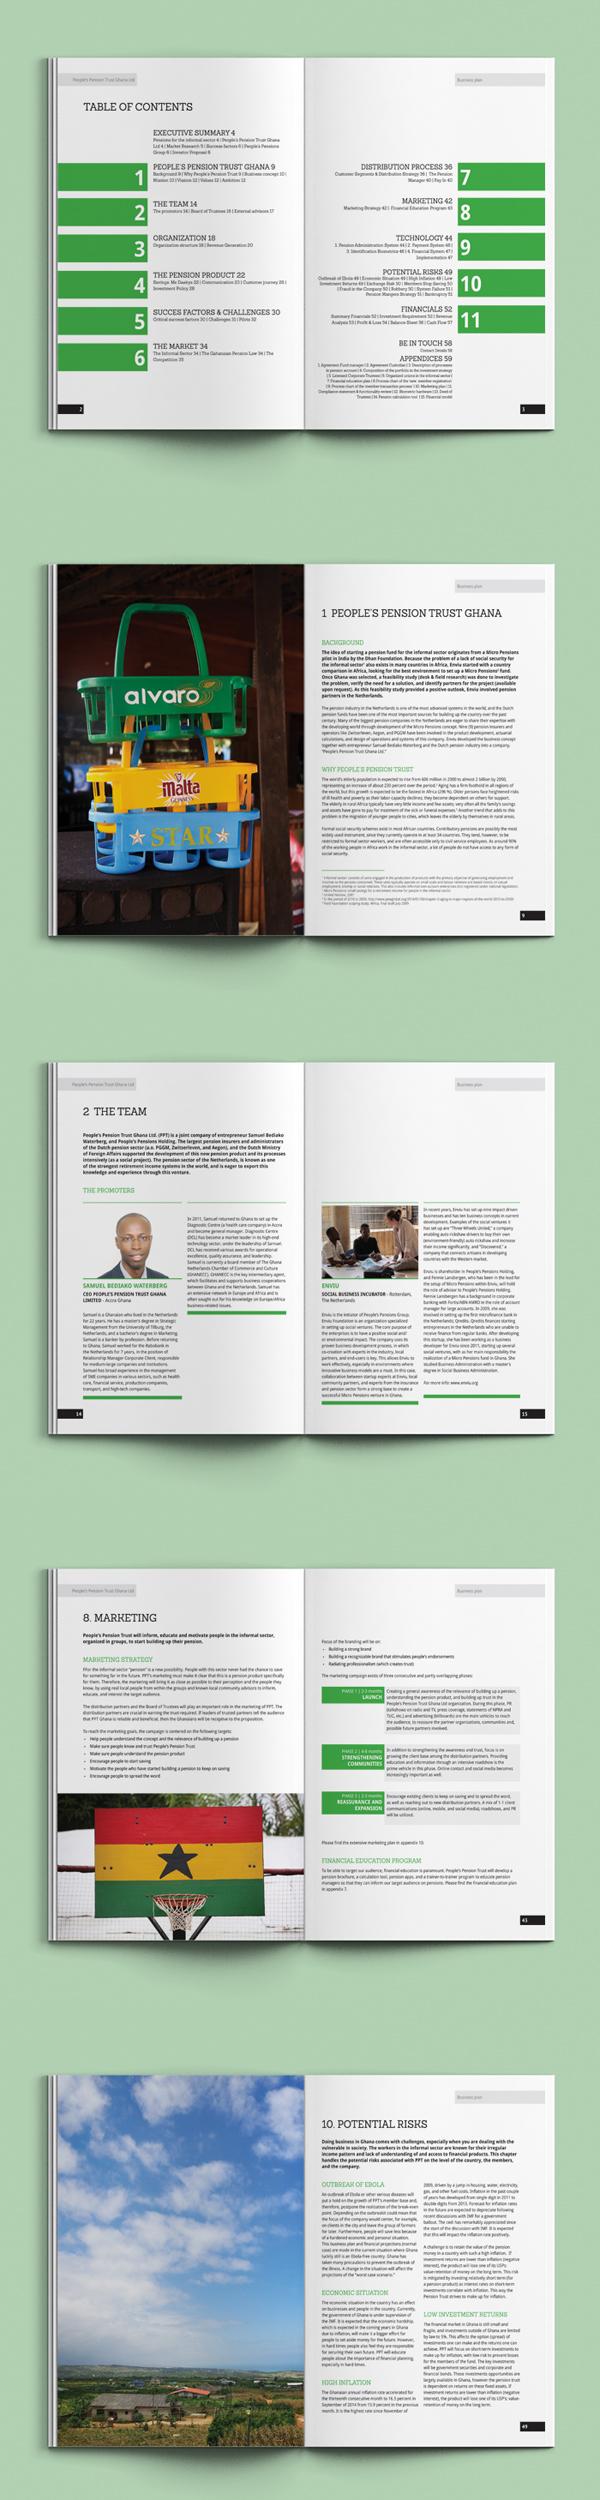 Businessplan_pptg